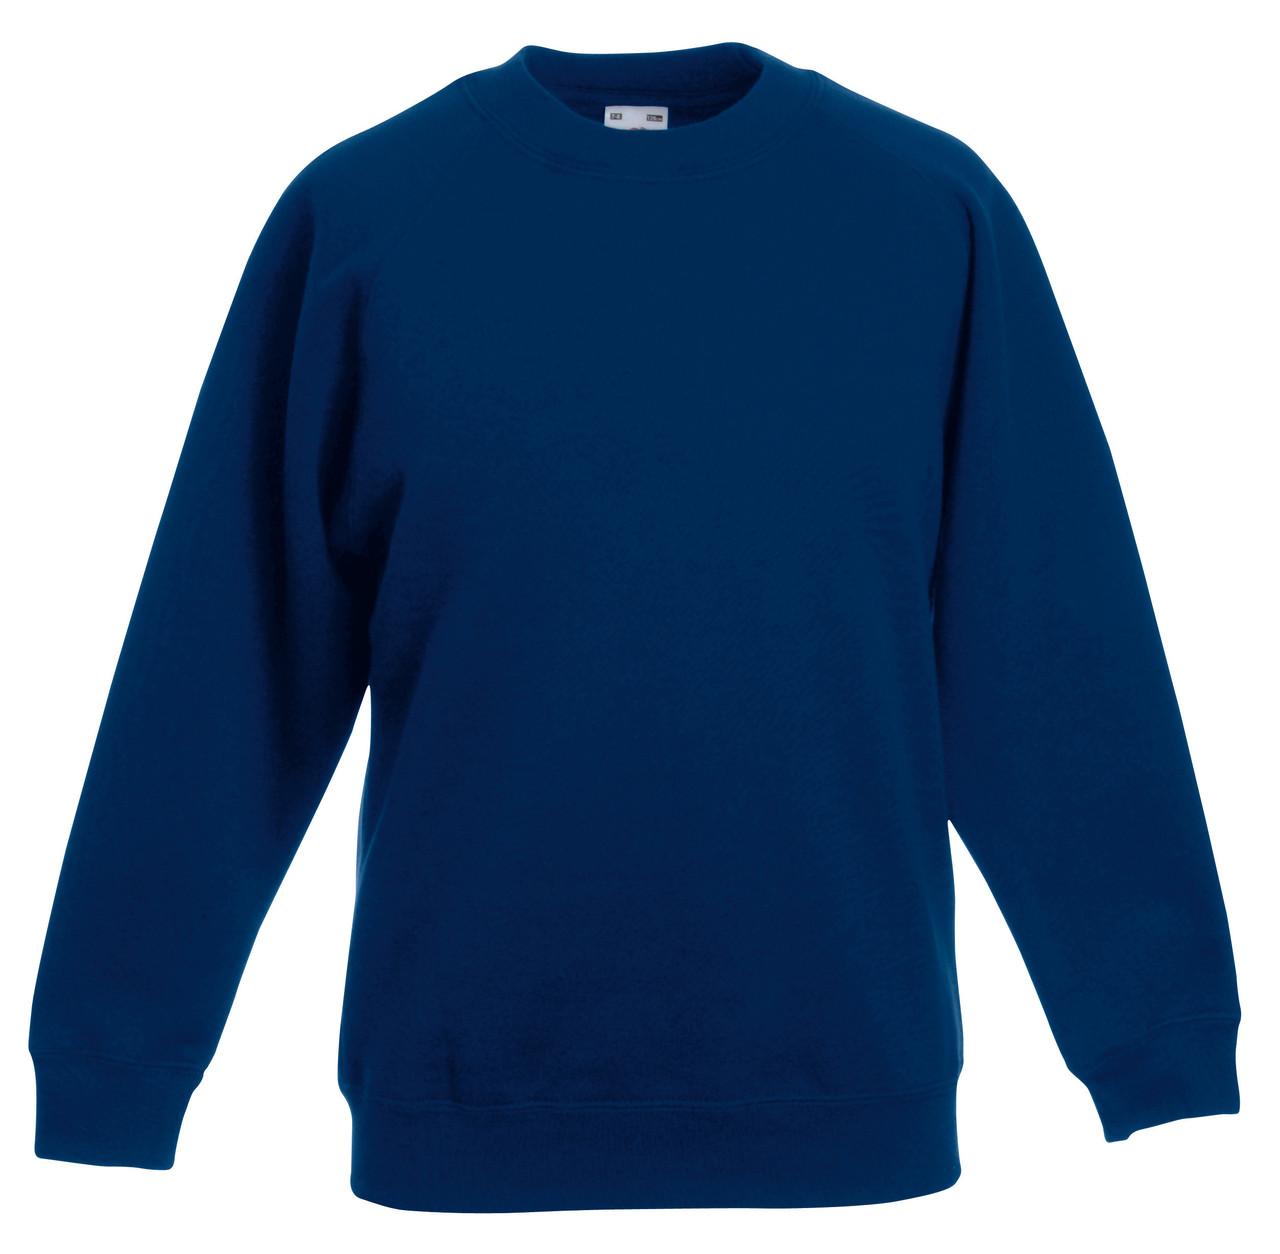 Детский классический реглан Тёмно-синий  Fruit Of The Loom 62-039-32 9-11